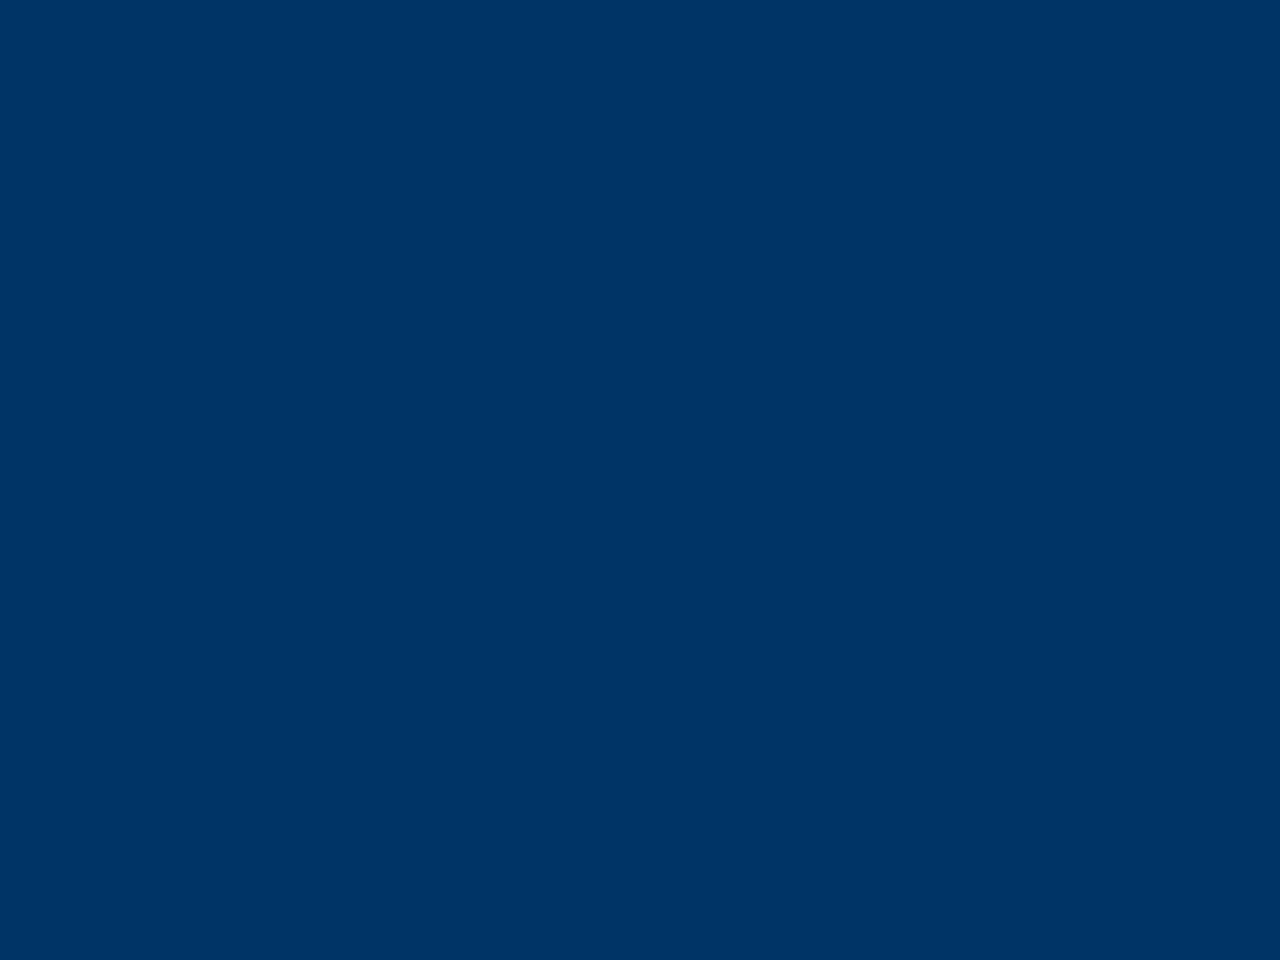 1280x960 Dark Midnight Blue Solid Color Background